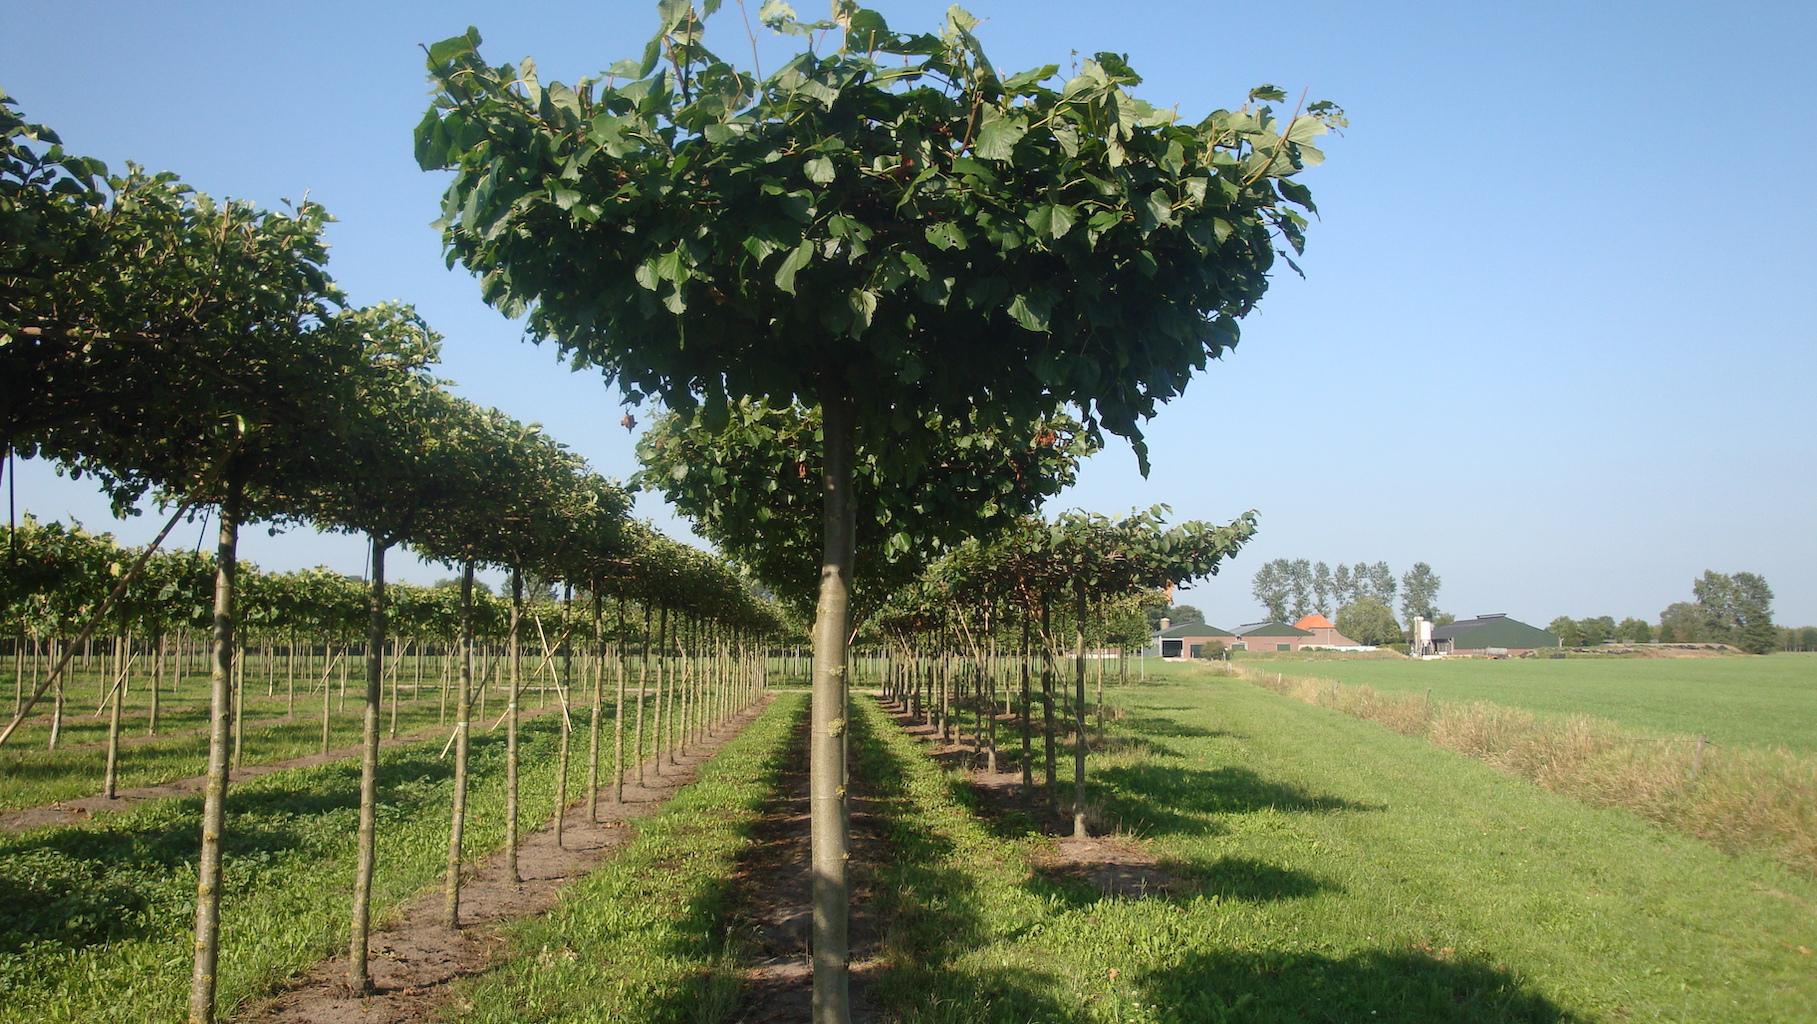 Tilia europaea 'Pallida' roof form Lime trees 25-30 grade